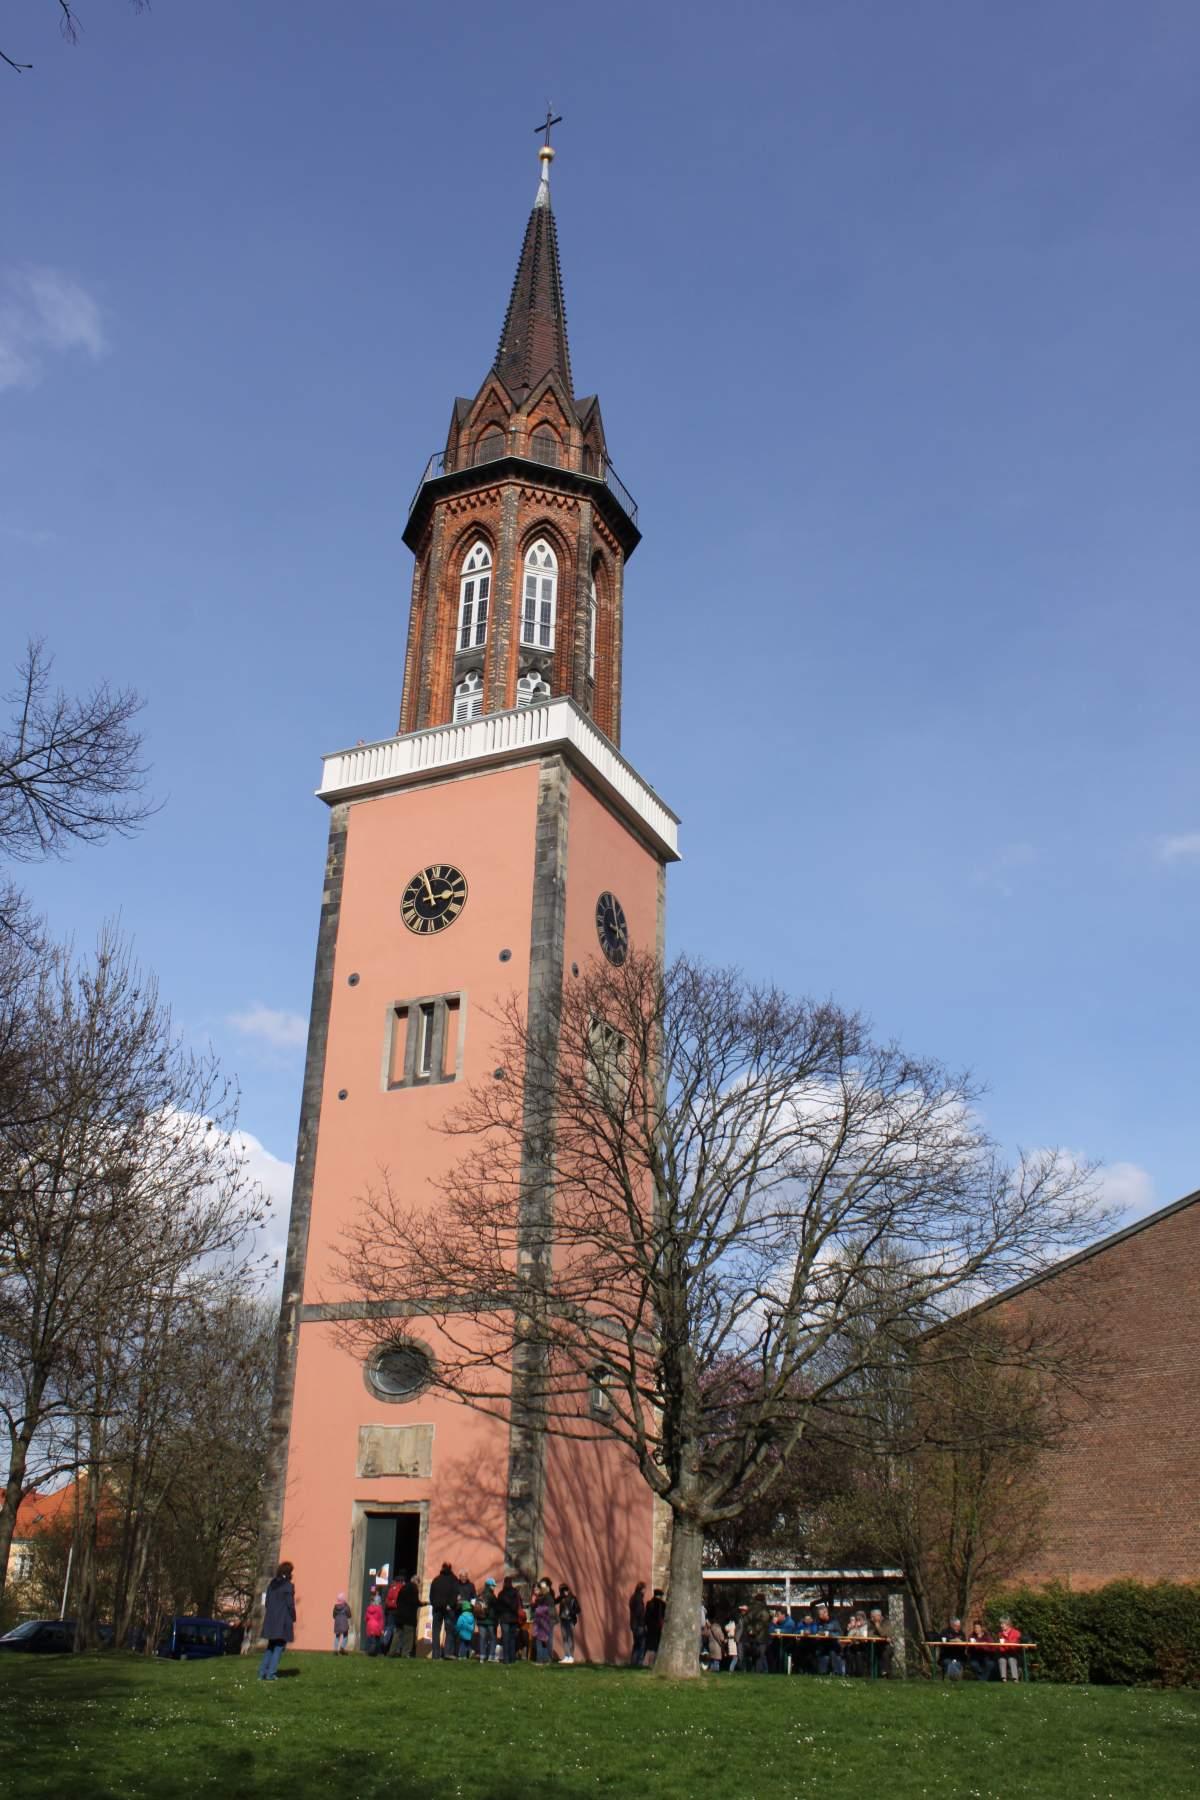 Turm der Martinskirche